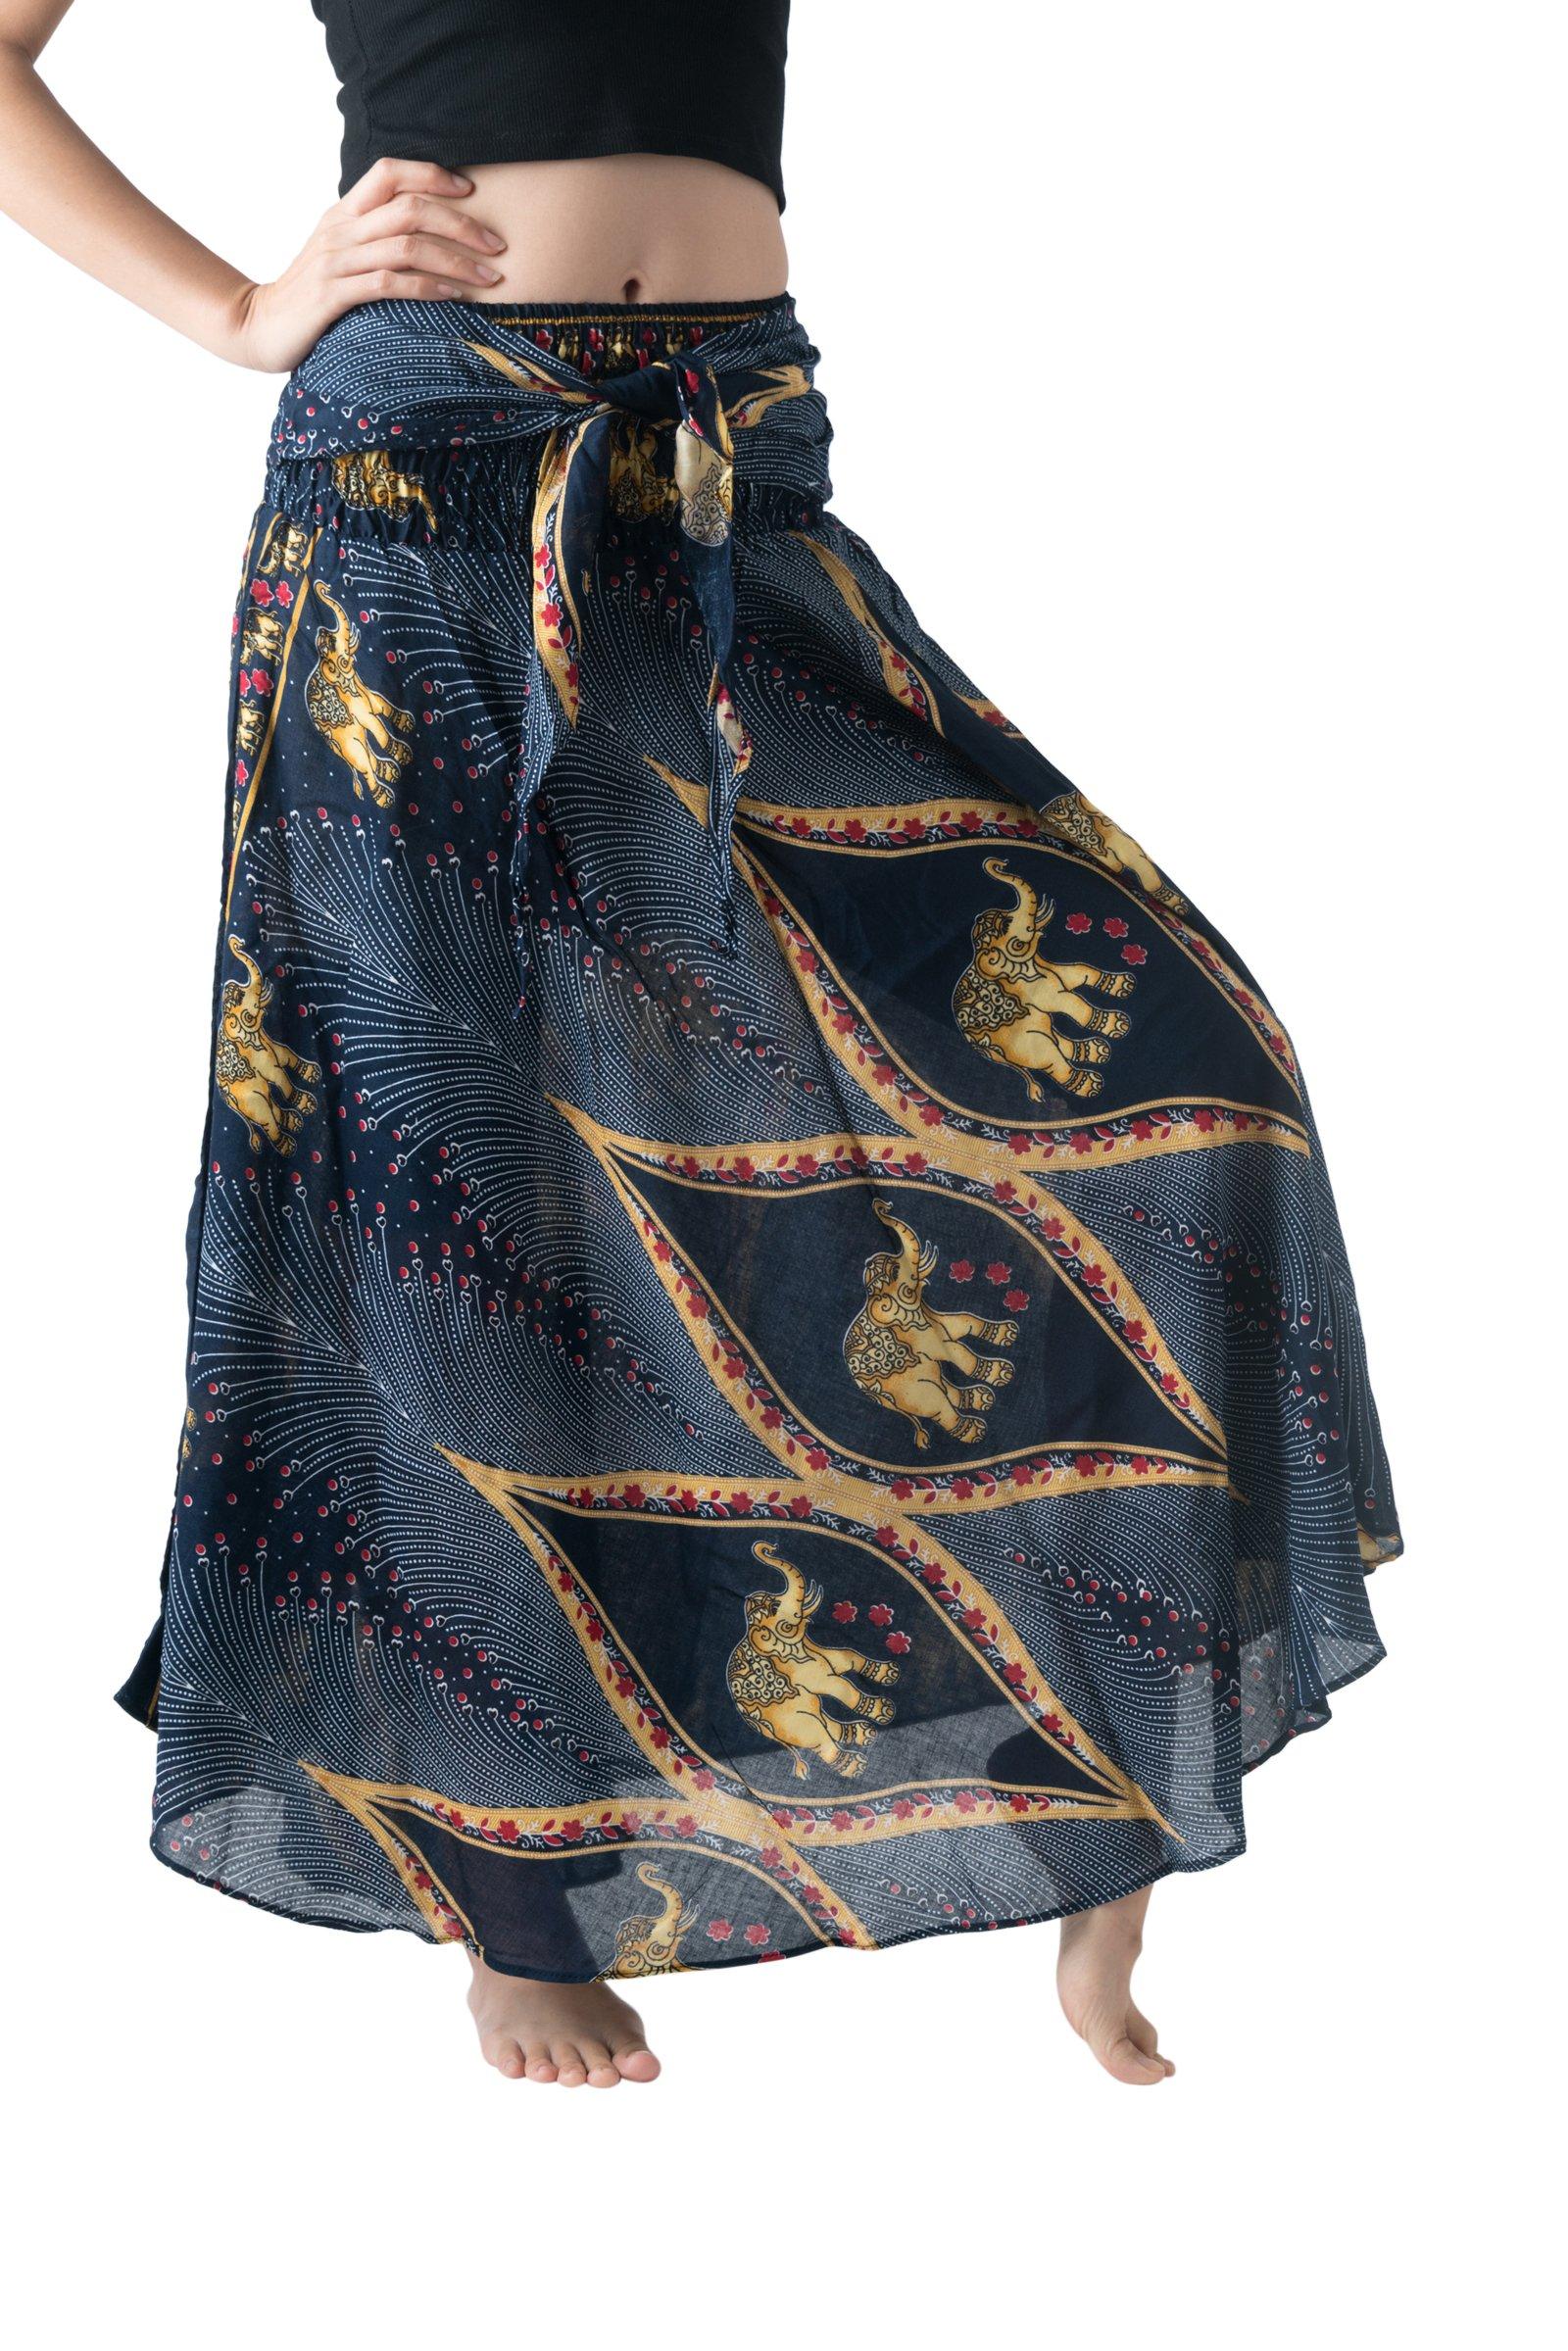 Bangkokpants Women's Long Bohemian Hippie Skirt Boho Dresses Elephant One Size Asymmetric Hem Design (Peacock Elephant Blue, Plus Size)